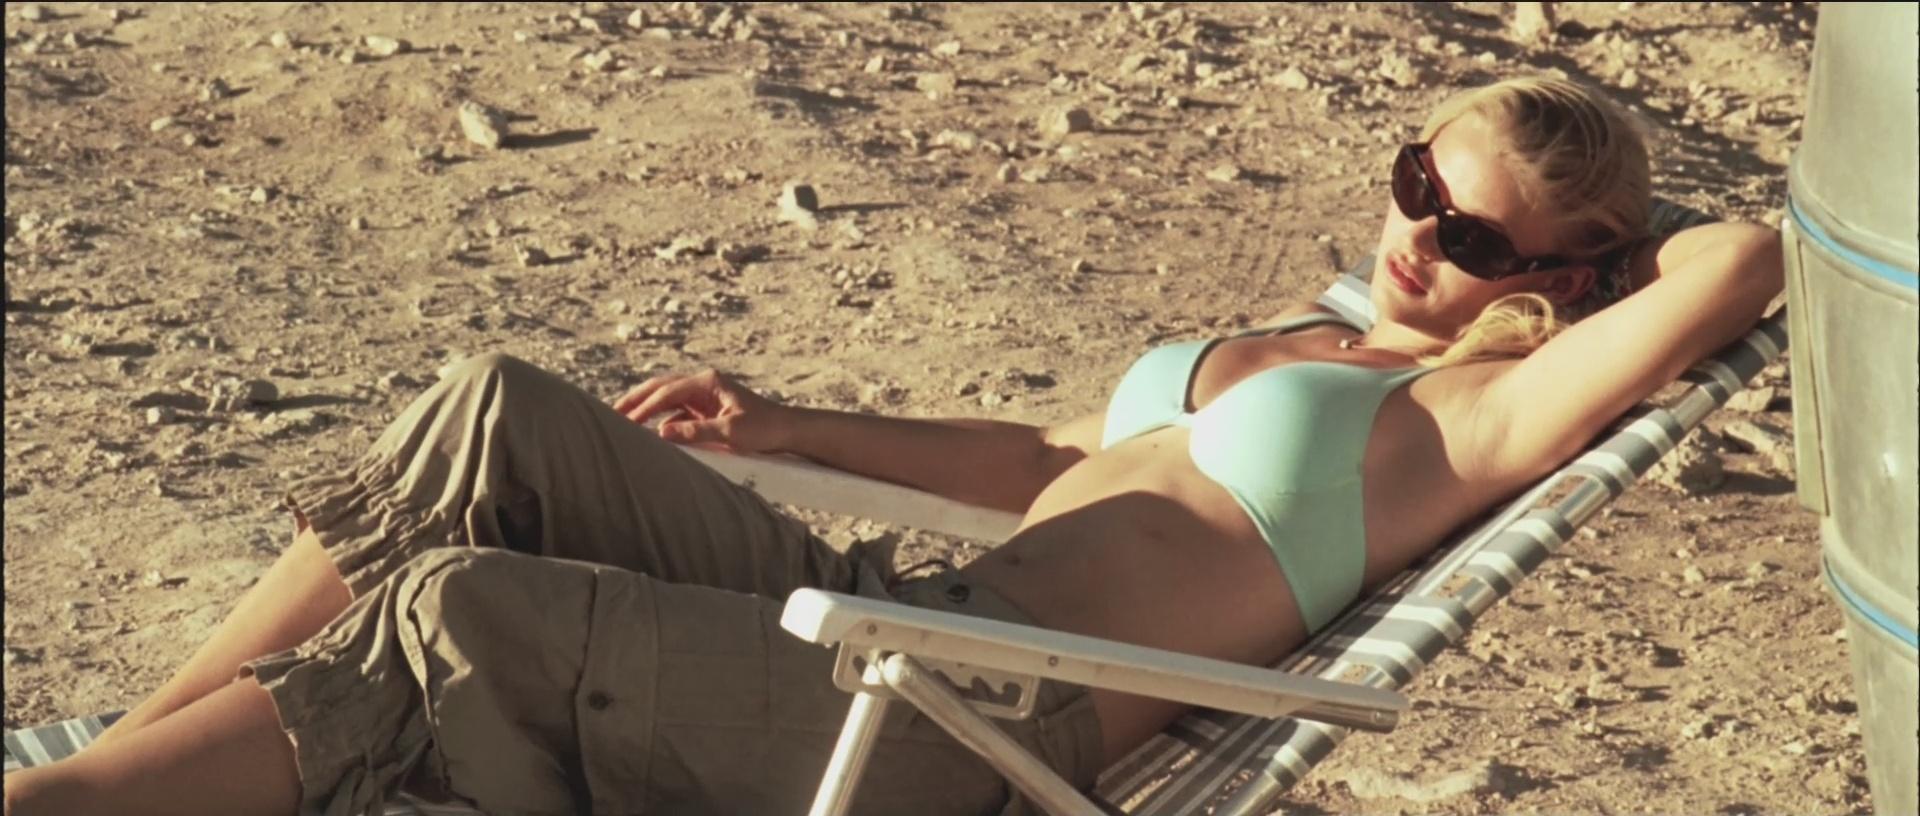 Emilie de Ravin Nude Pics & Videos, Sex Tape < ANCENSORED